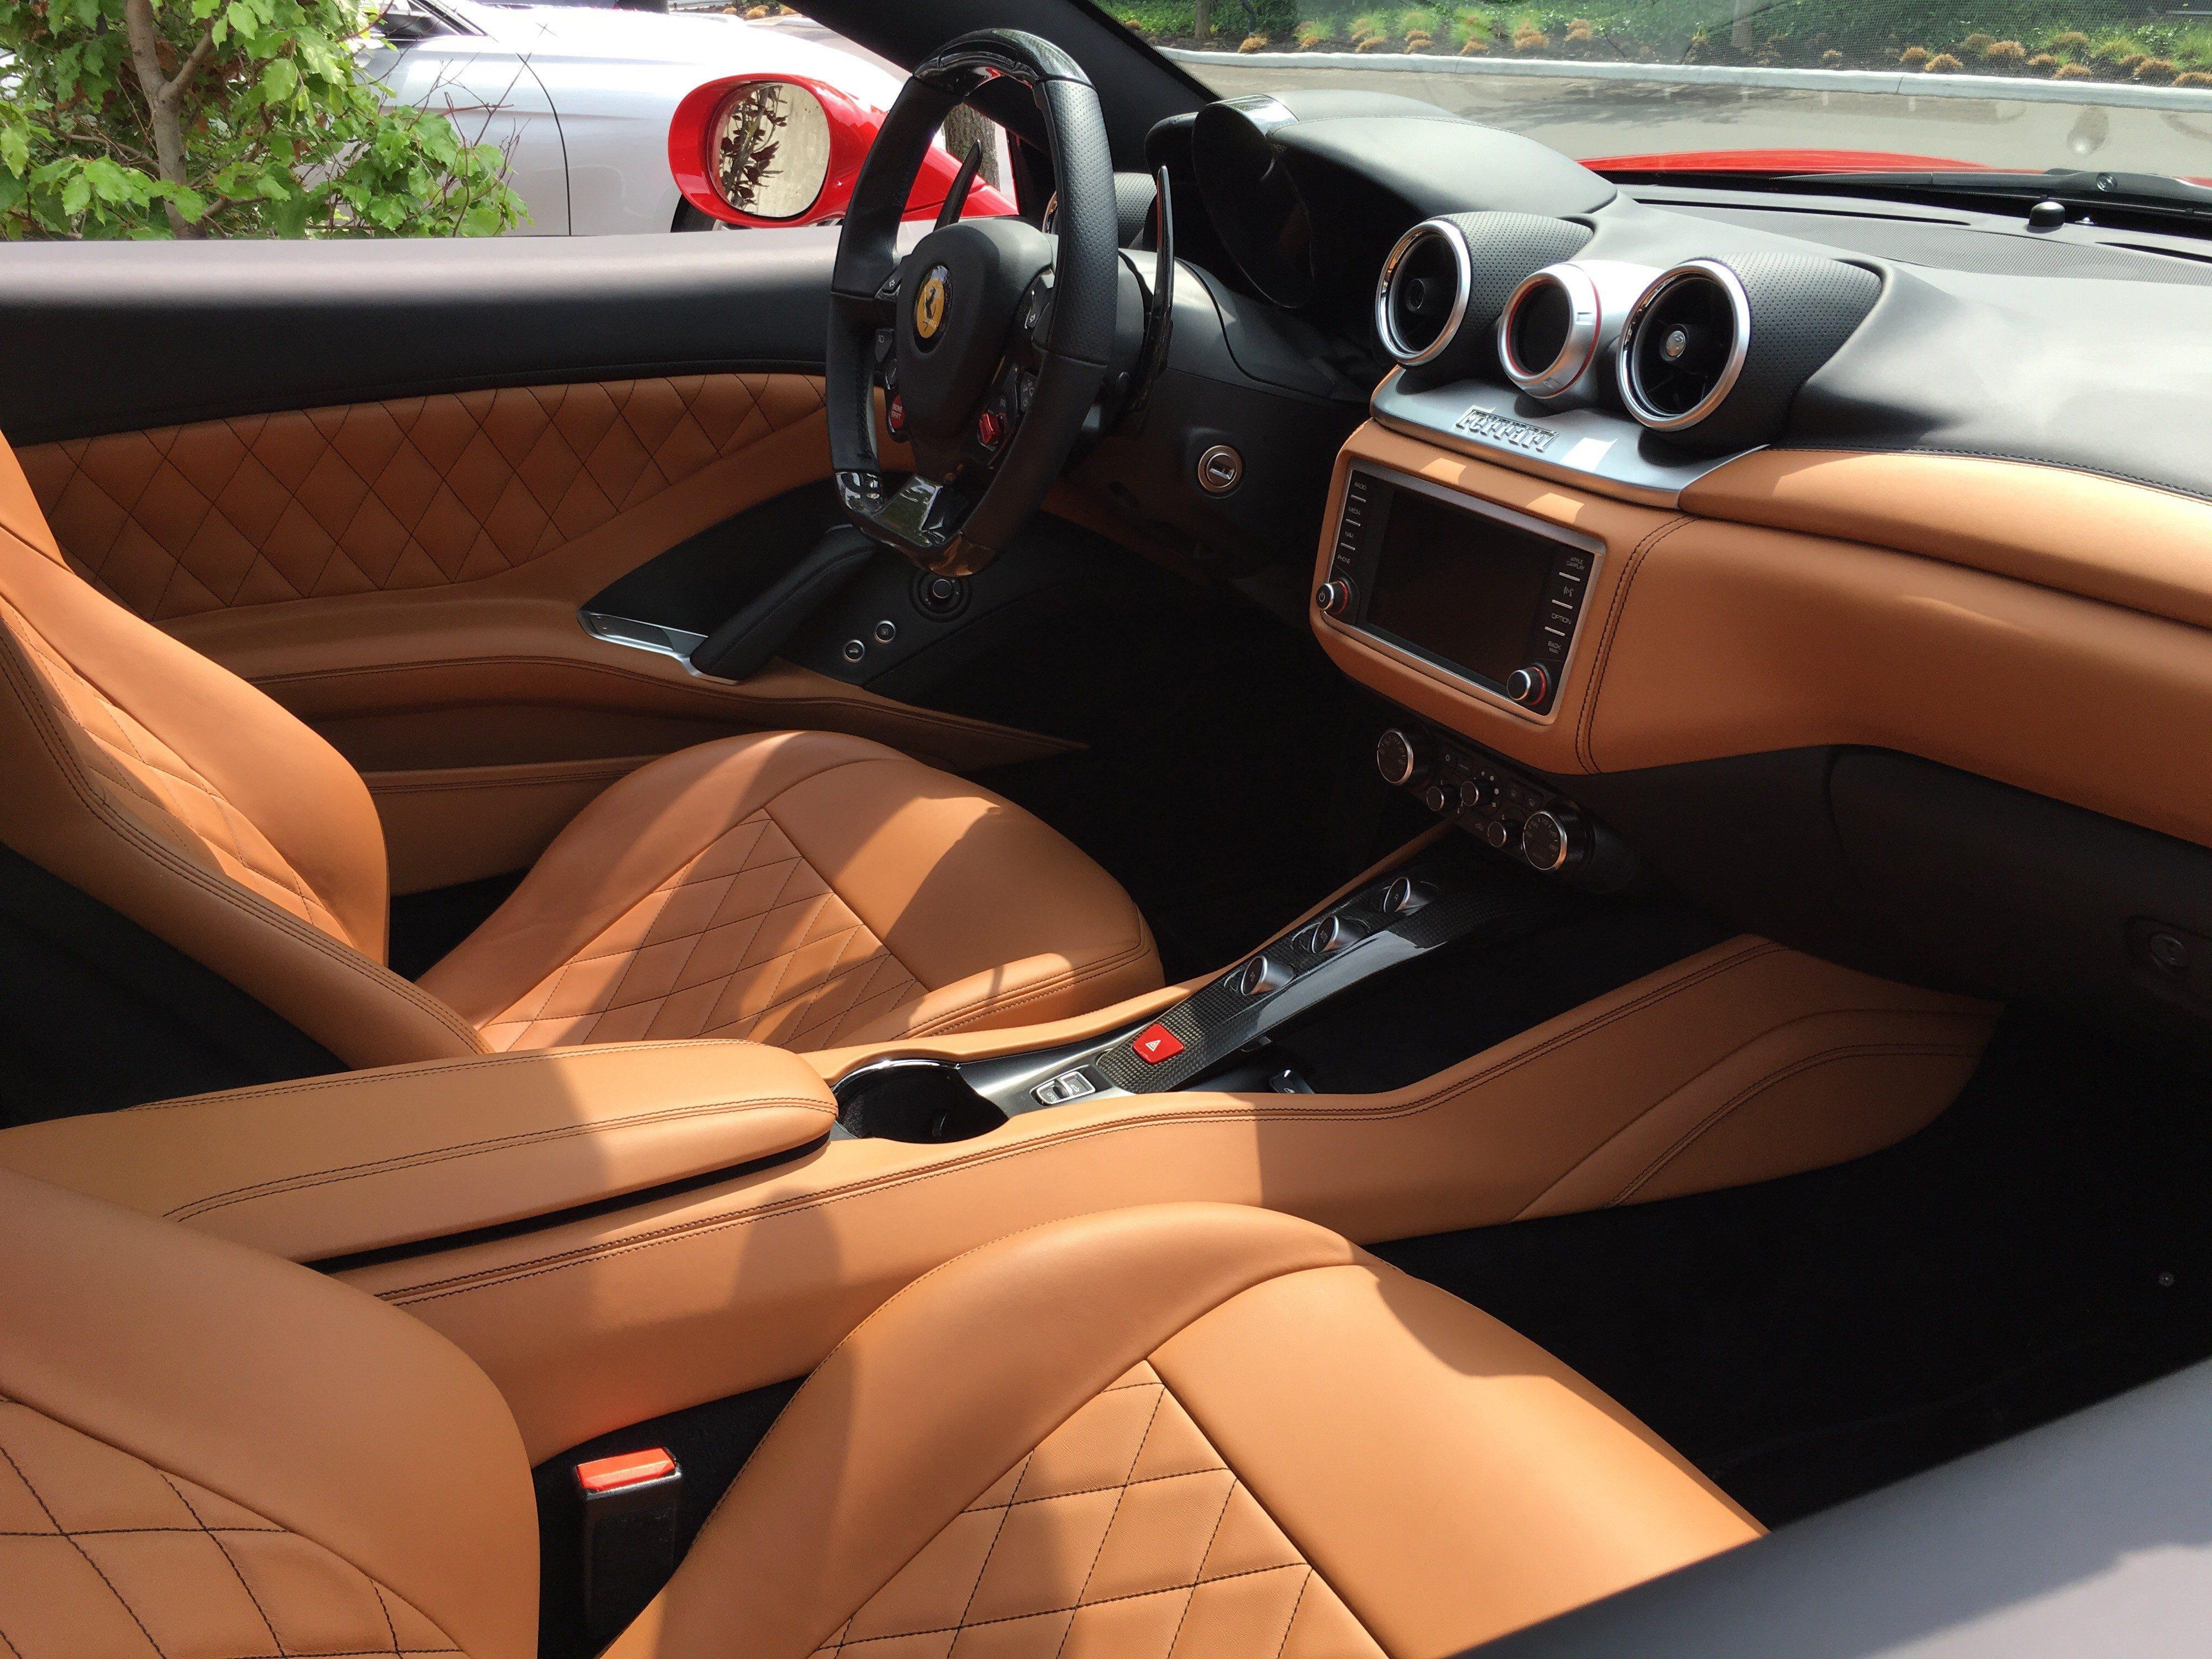 Interior of a Ferrari California T - LK Wealth Management